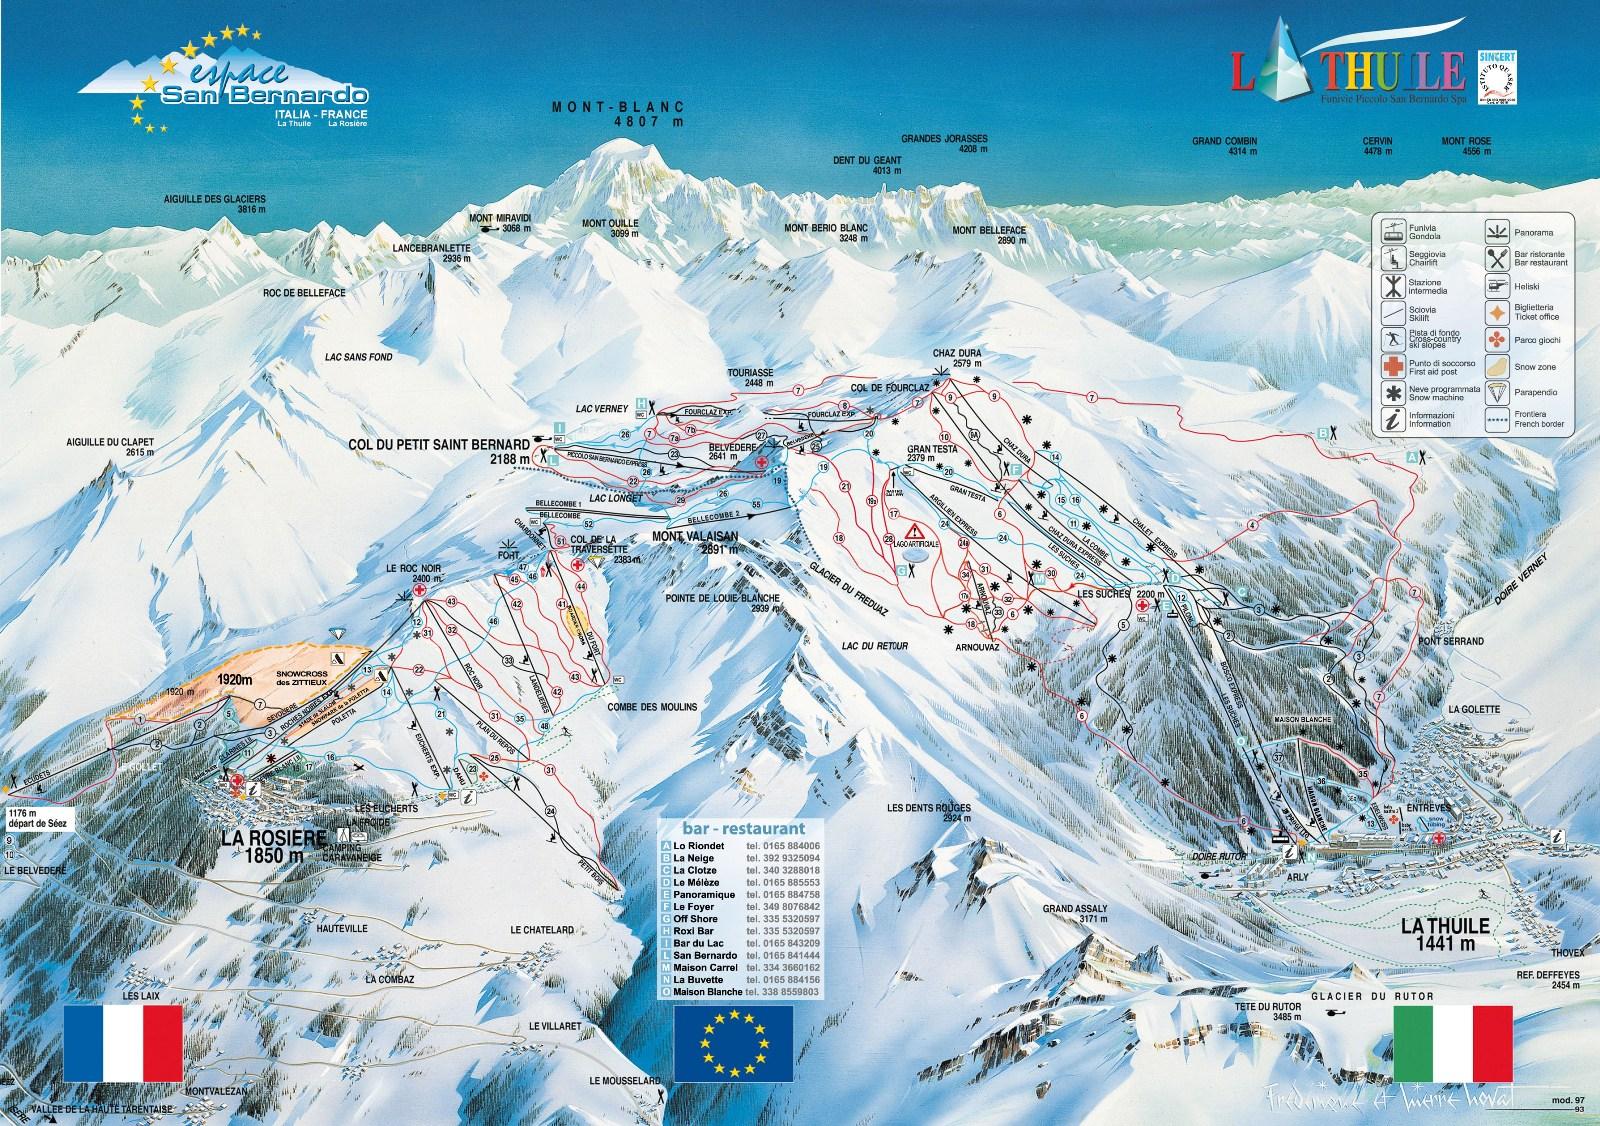 Aosta-völgy, La Thulie-la Rosiere